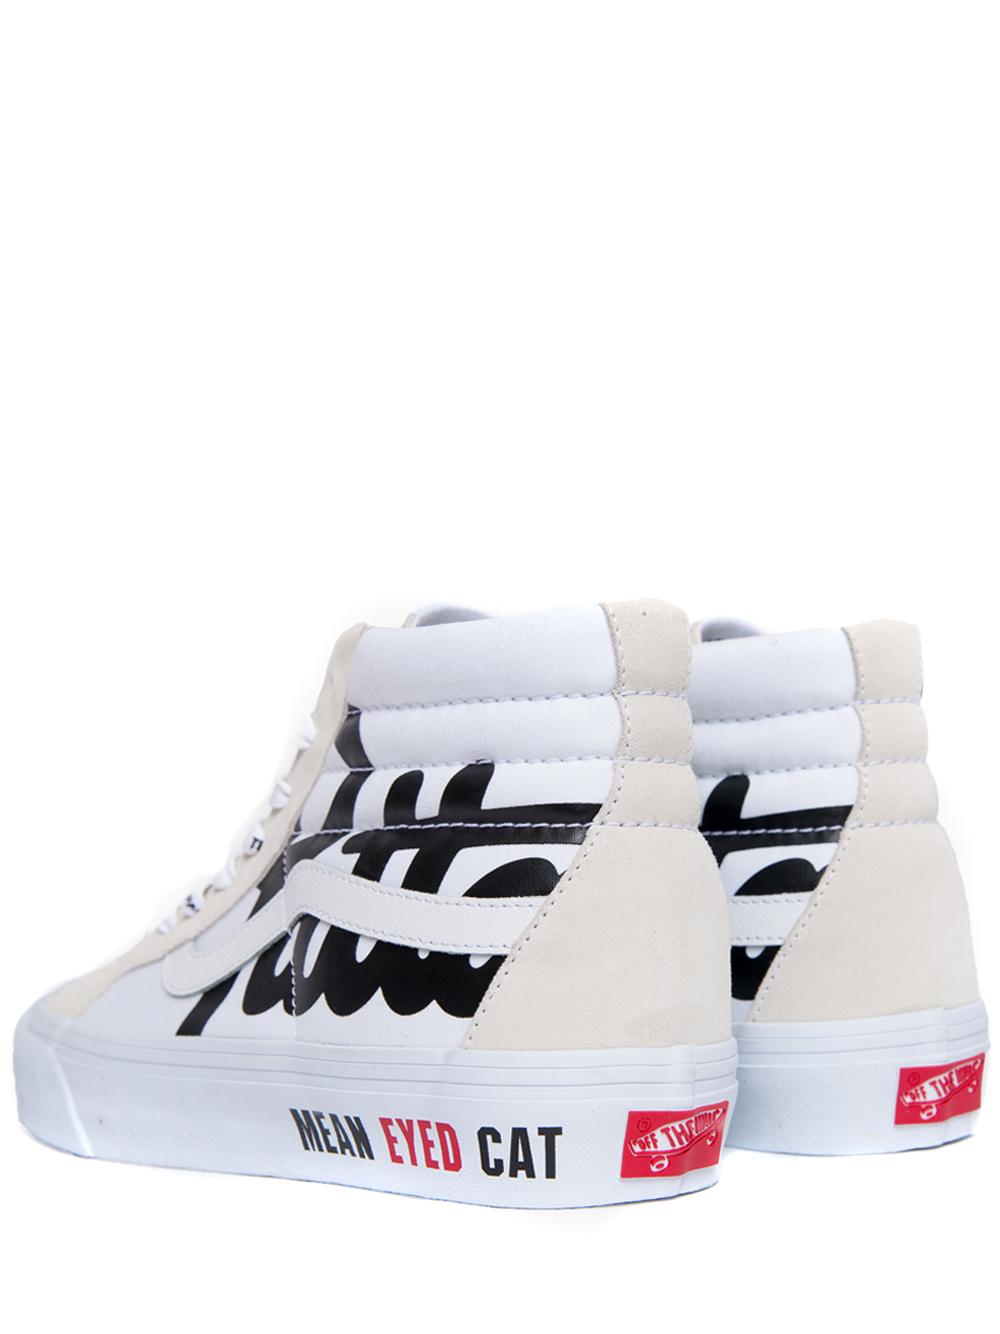 ua sk8 hi reissue vl sneakers unisex white VANS VAULT X PATTA | Sneakers | VN0A4BV5WW1